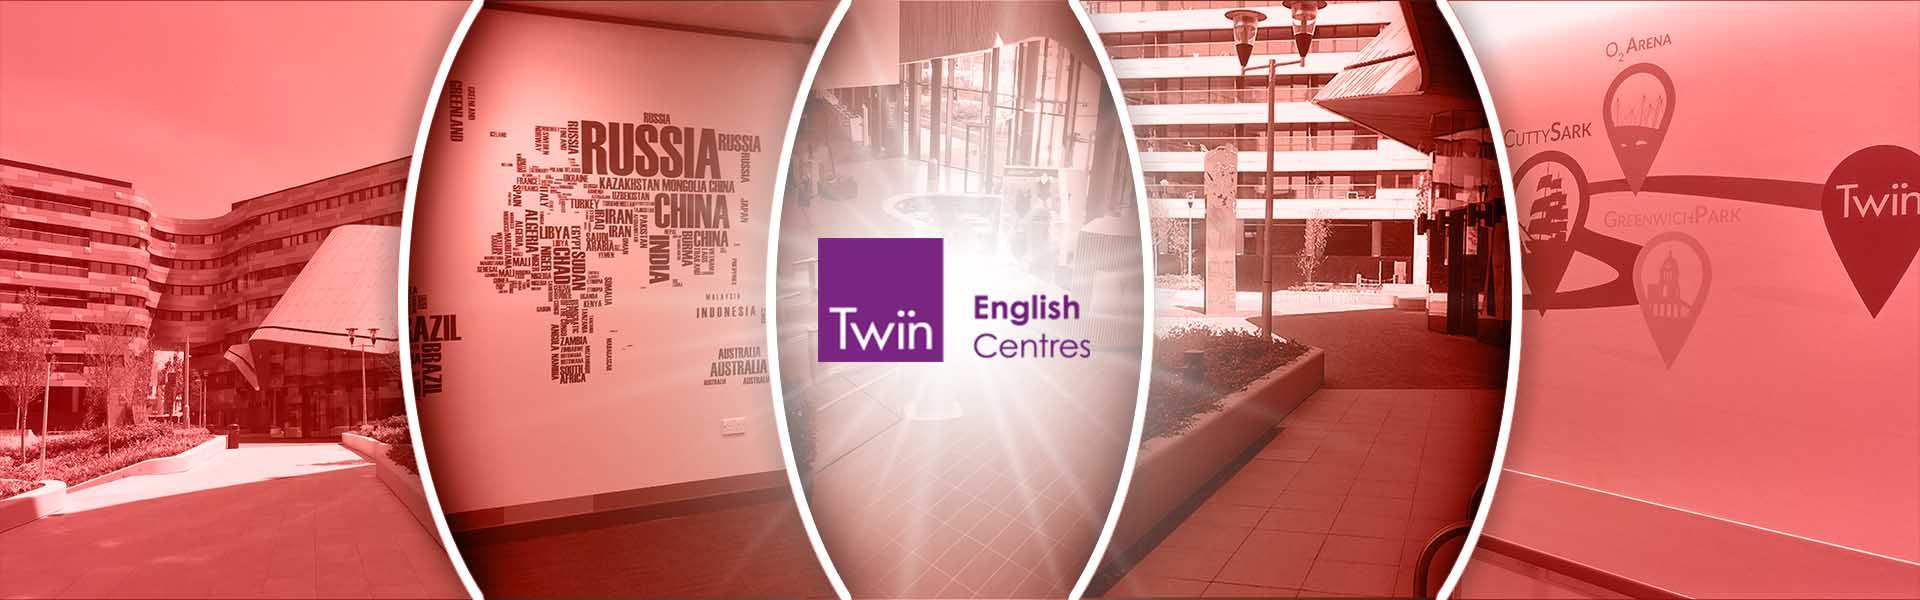 Twin Londra Dil Okulu